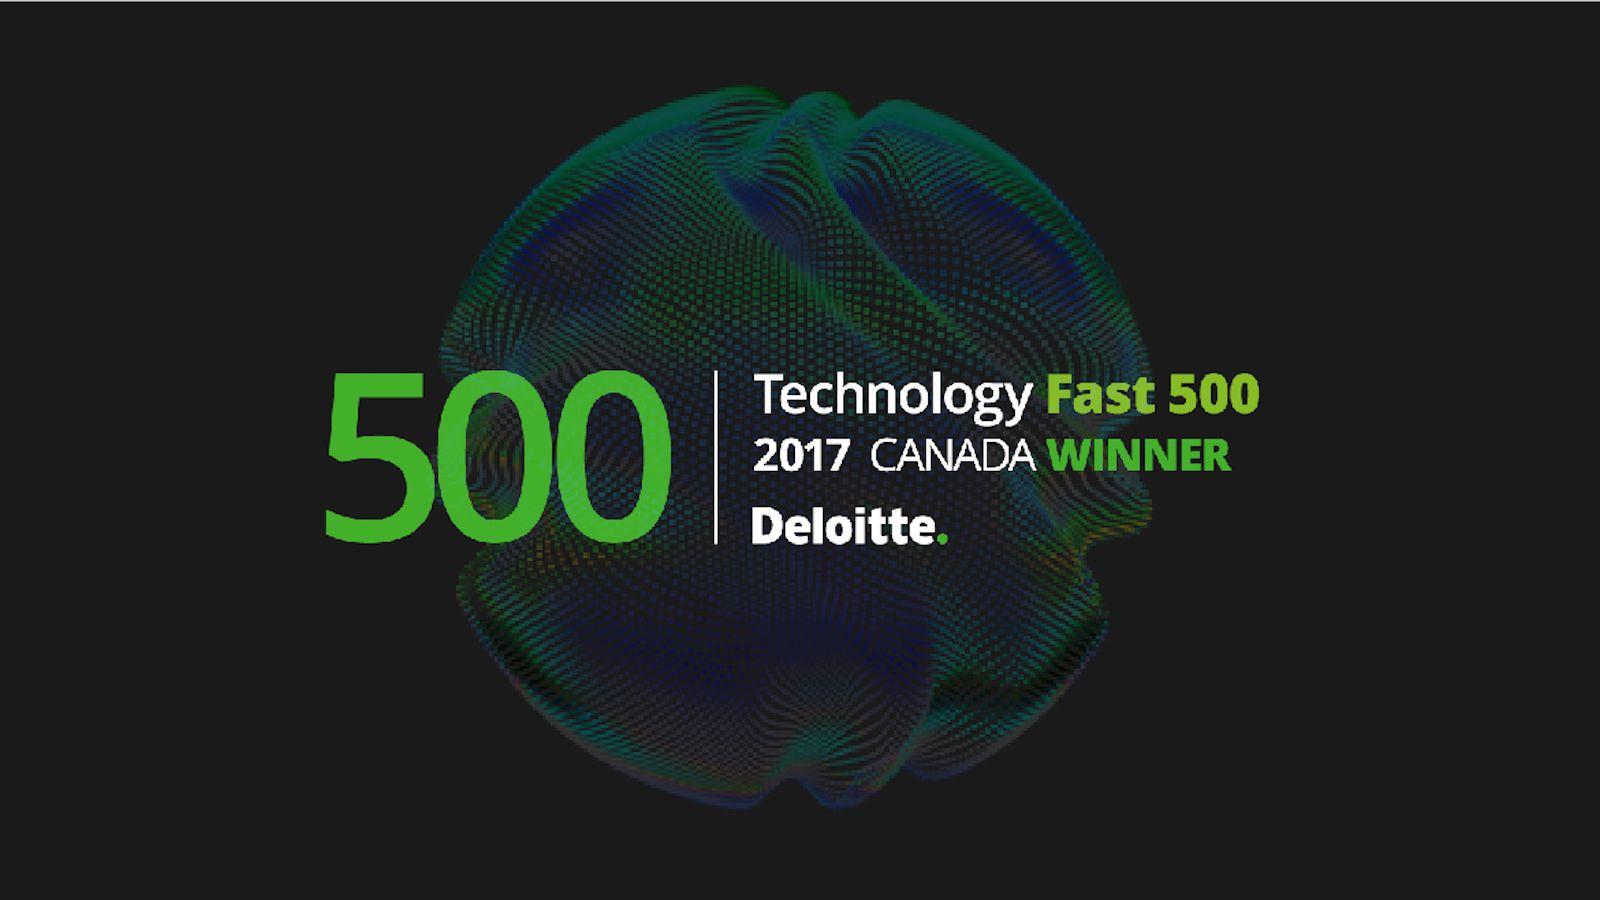 Technology Fast 50 winner- mobileLIVE